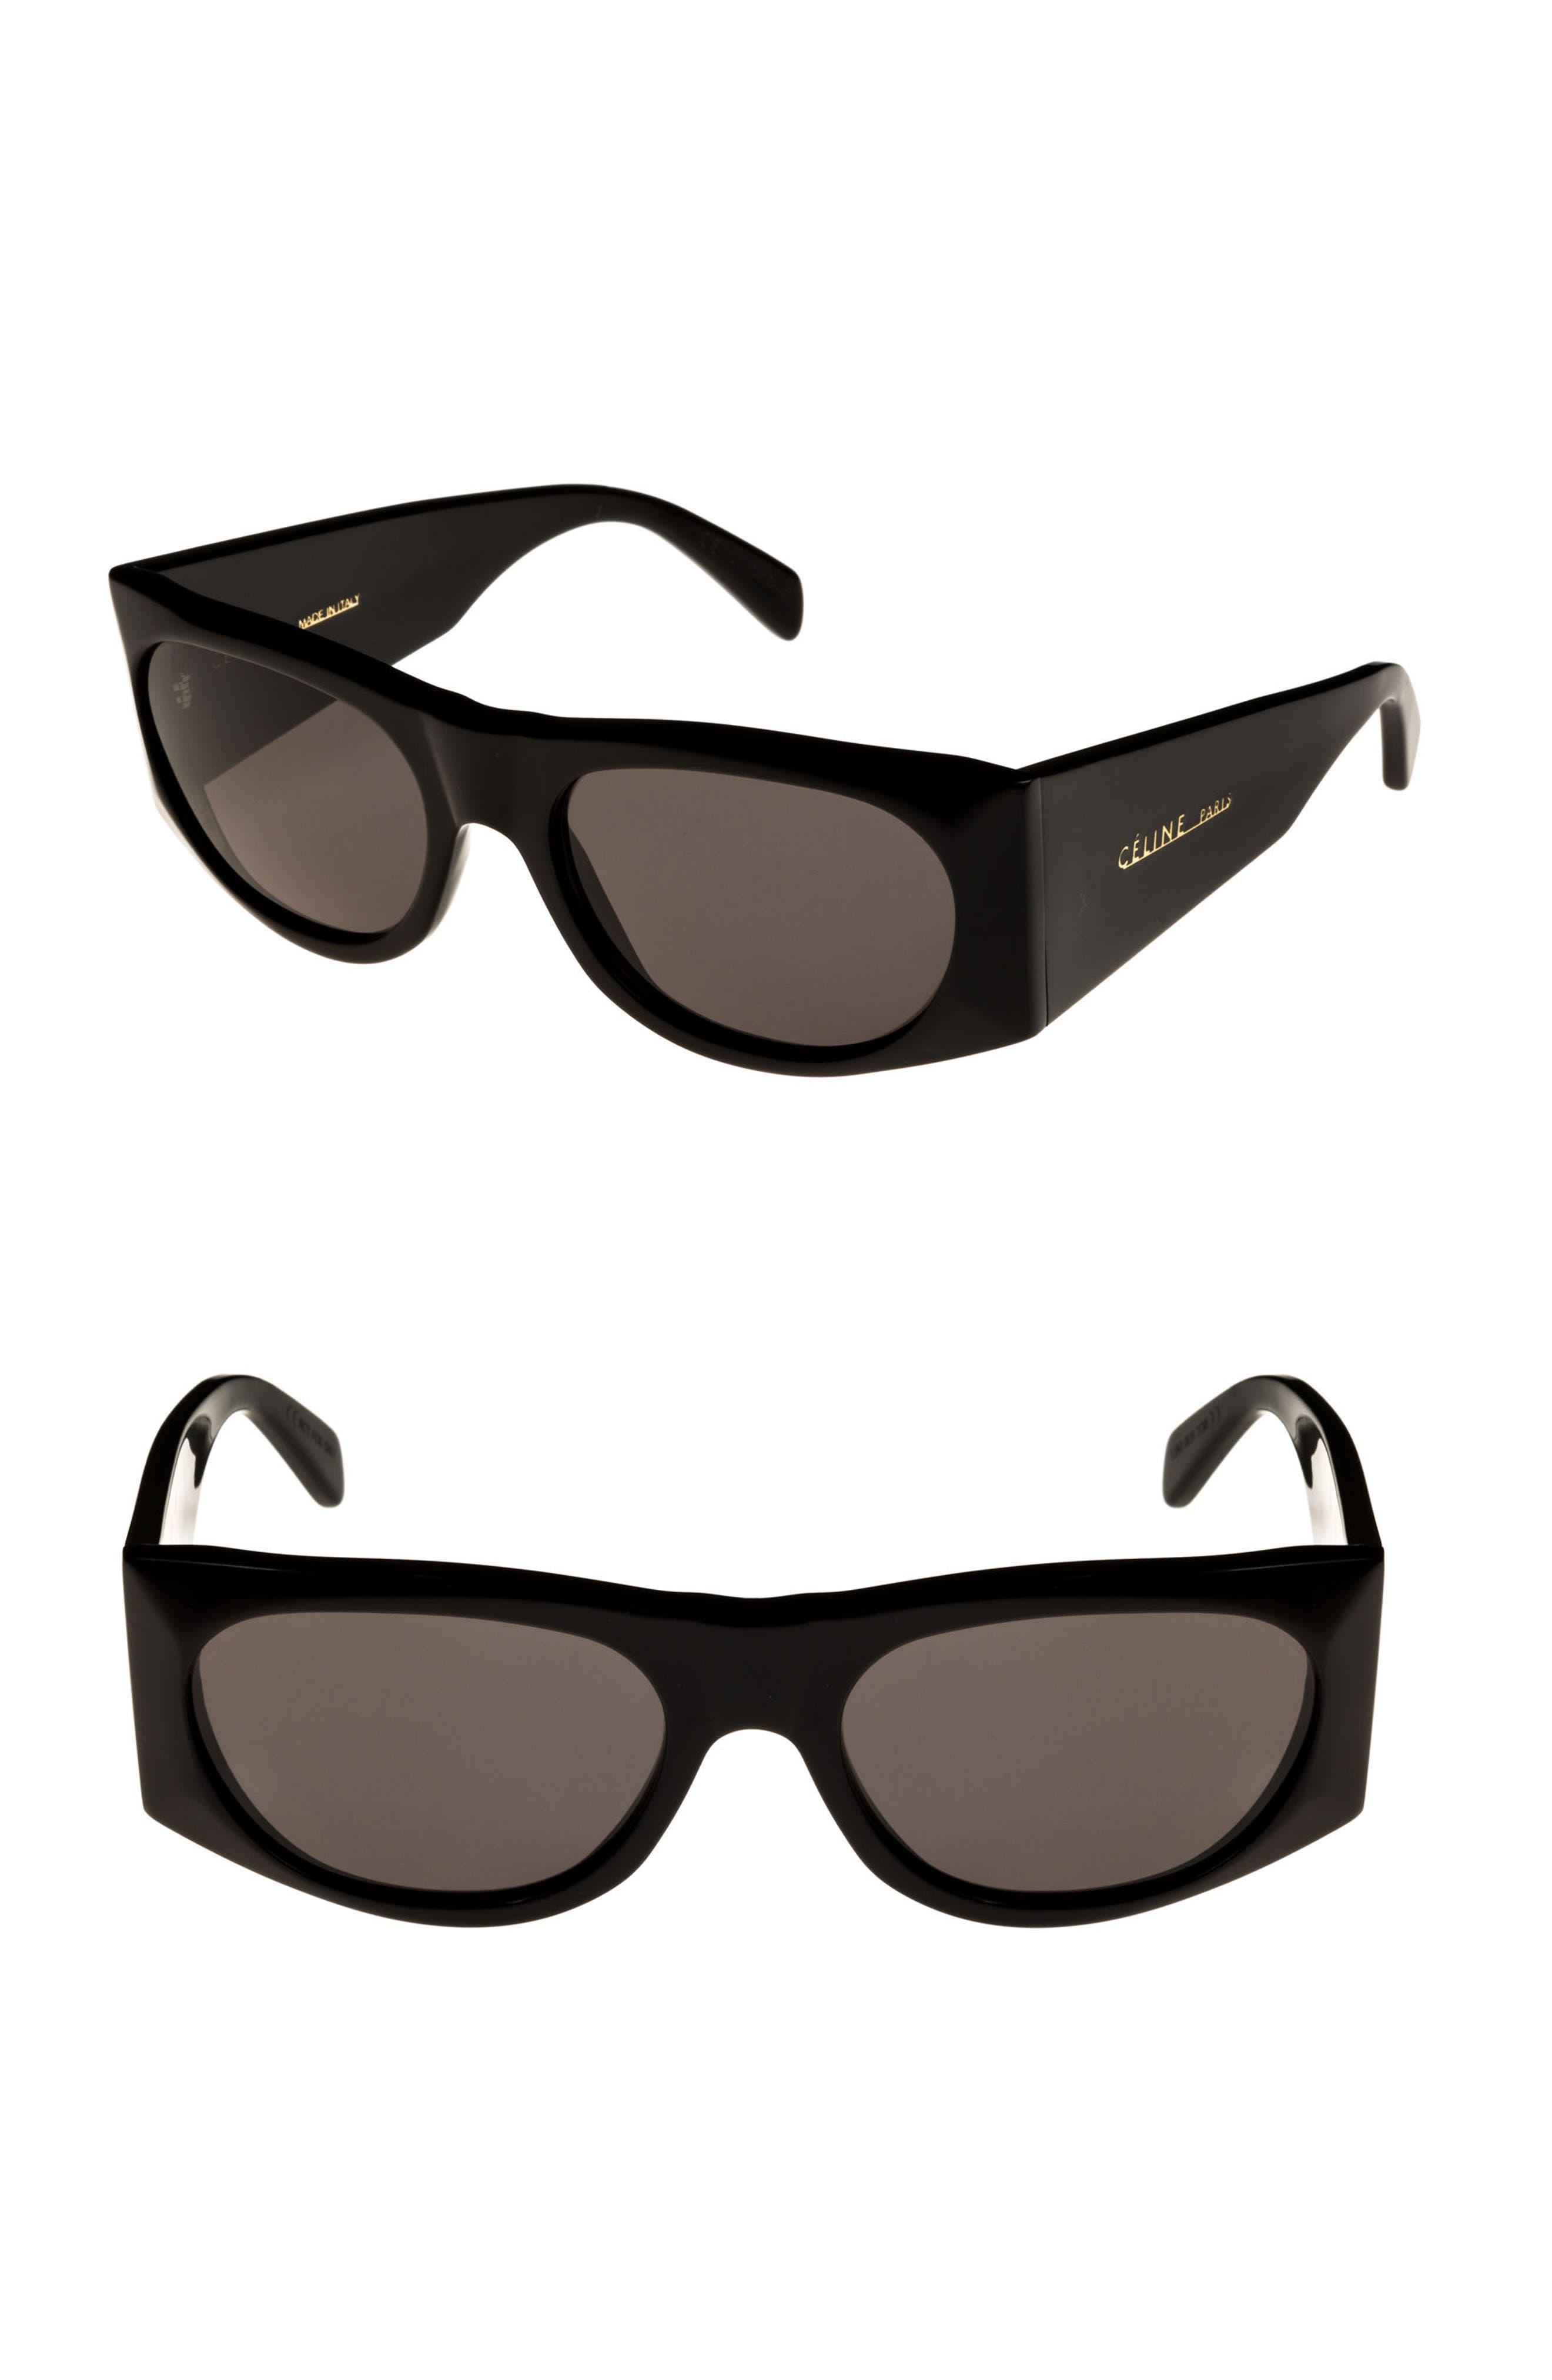 59mm Sunglasses,                         Main,                         color, BLACK/ SMOKE